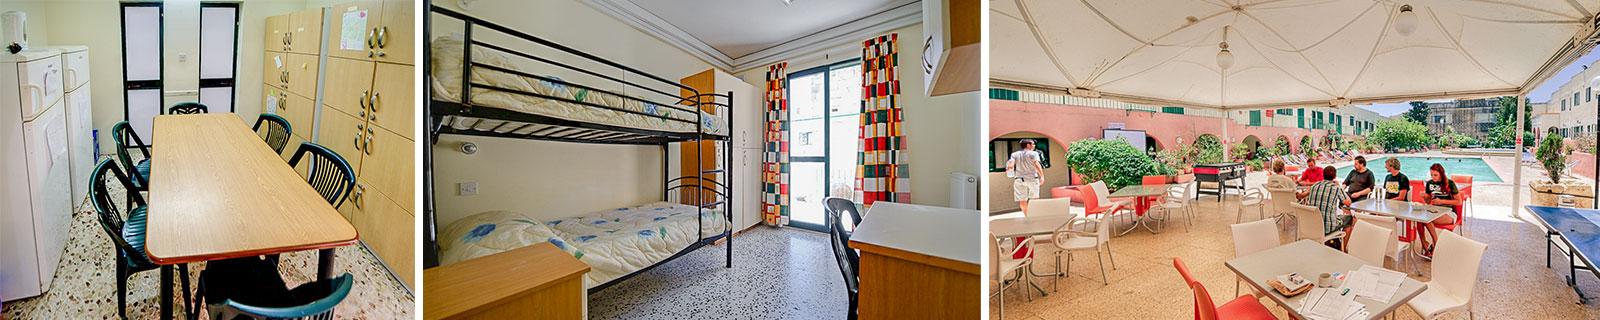 Studentenwohnheim